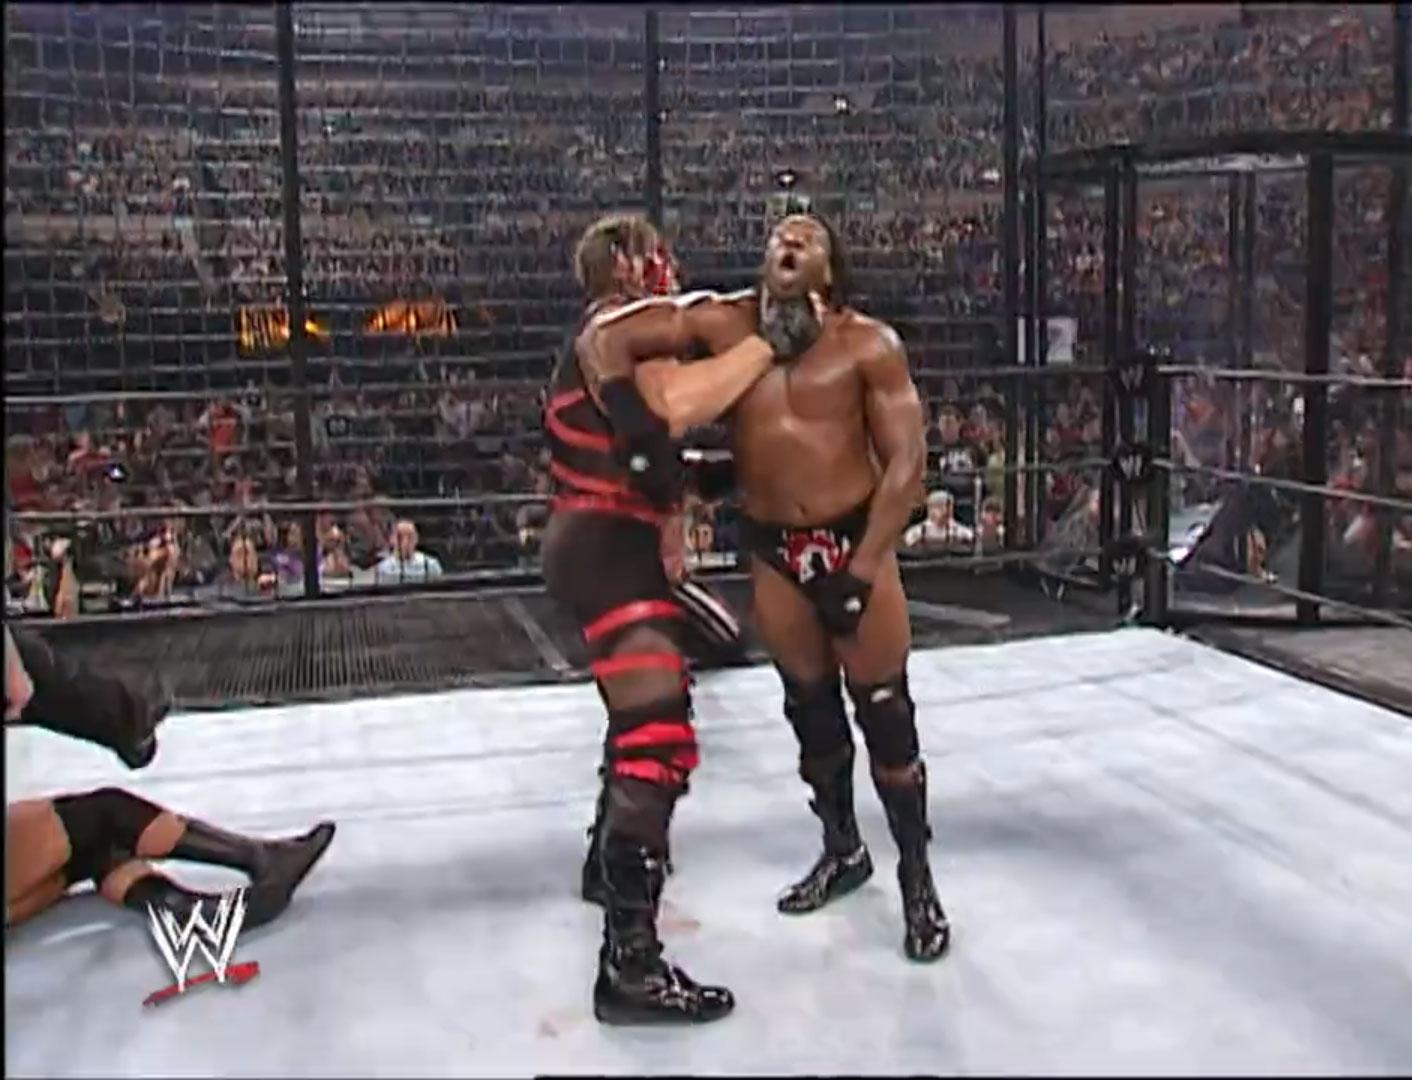 Booker T. vs. Chris Jericho vs. Kane vs. Rob Van Dam vs. Triple H Elimination Chamber, WWE World Heavyweight Championship Survivor Series '02, Nov 17th 2002